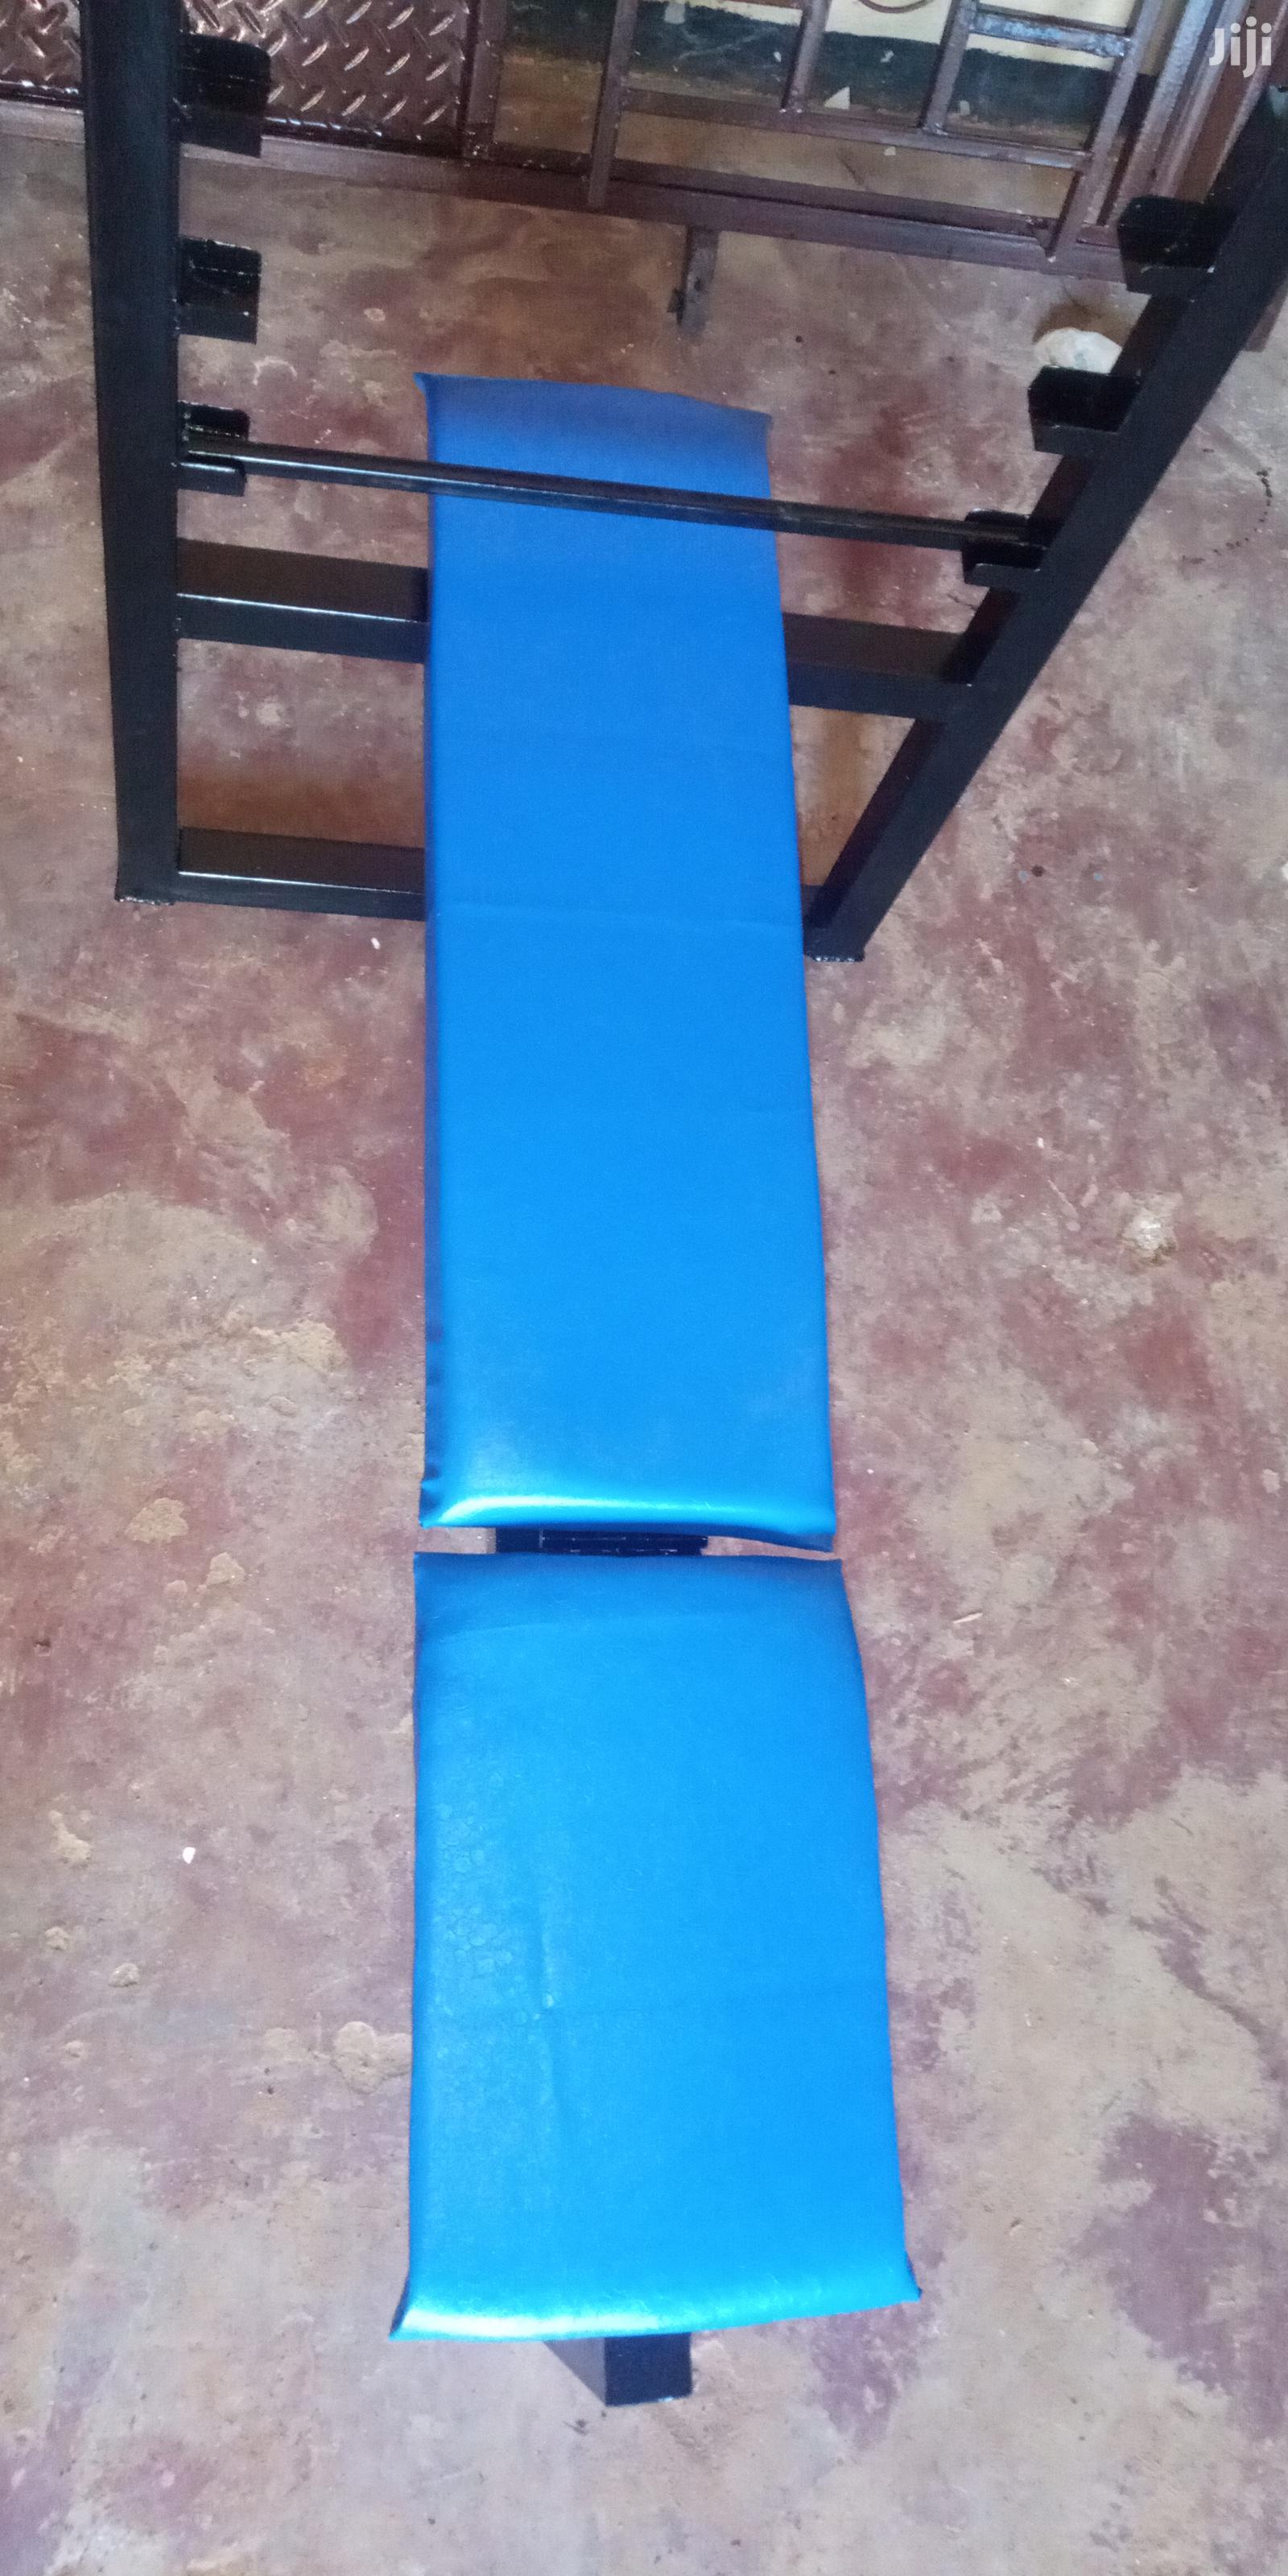 Gym Bench Adjustable   Sports Equipment for sale in Kampala, Uganda